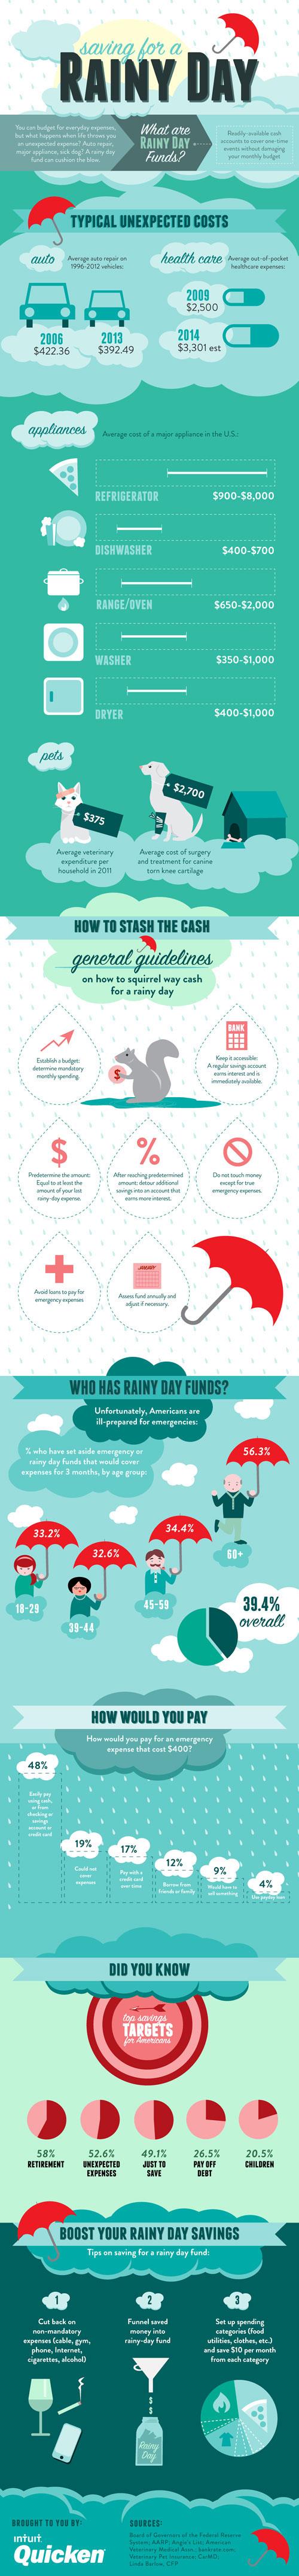 saving-for-a-rainy-day_5594384032ec1-1